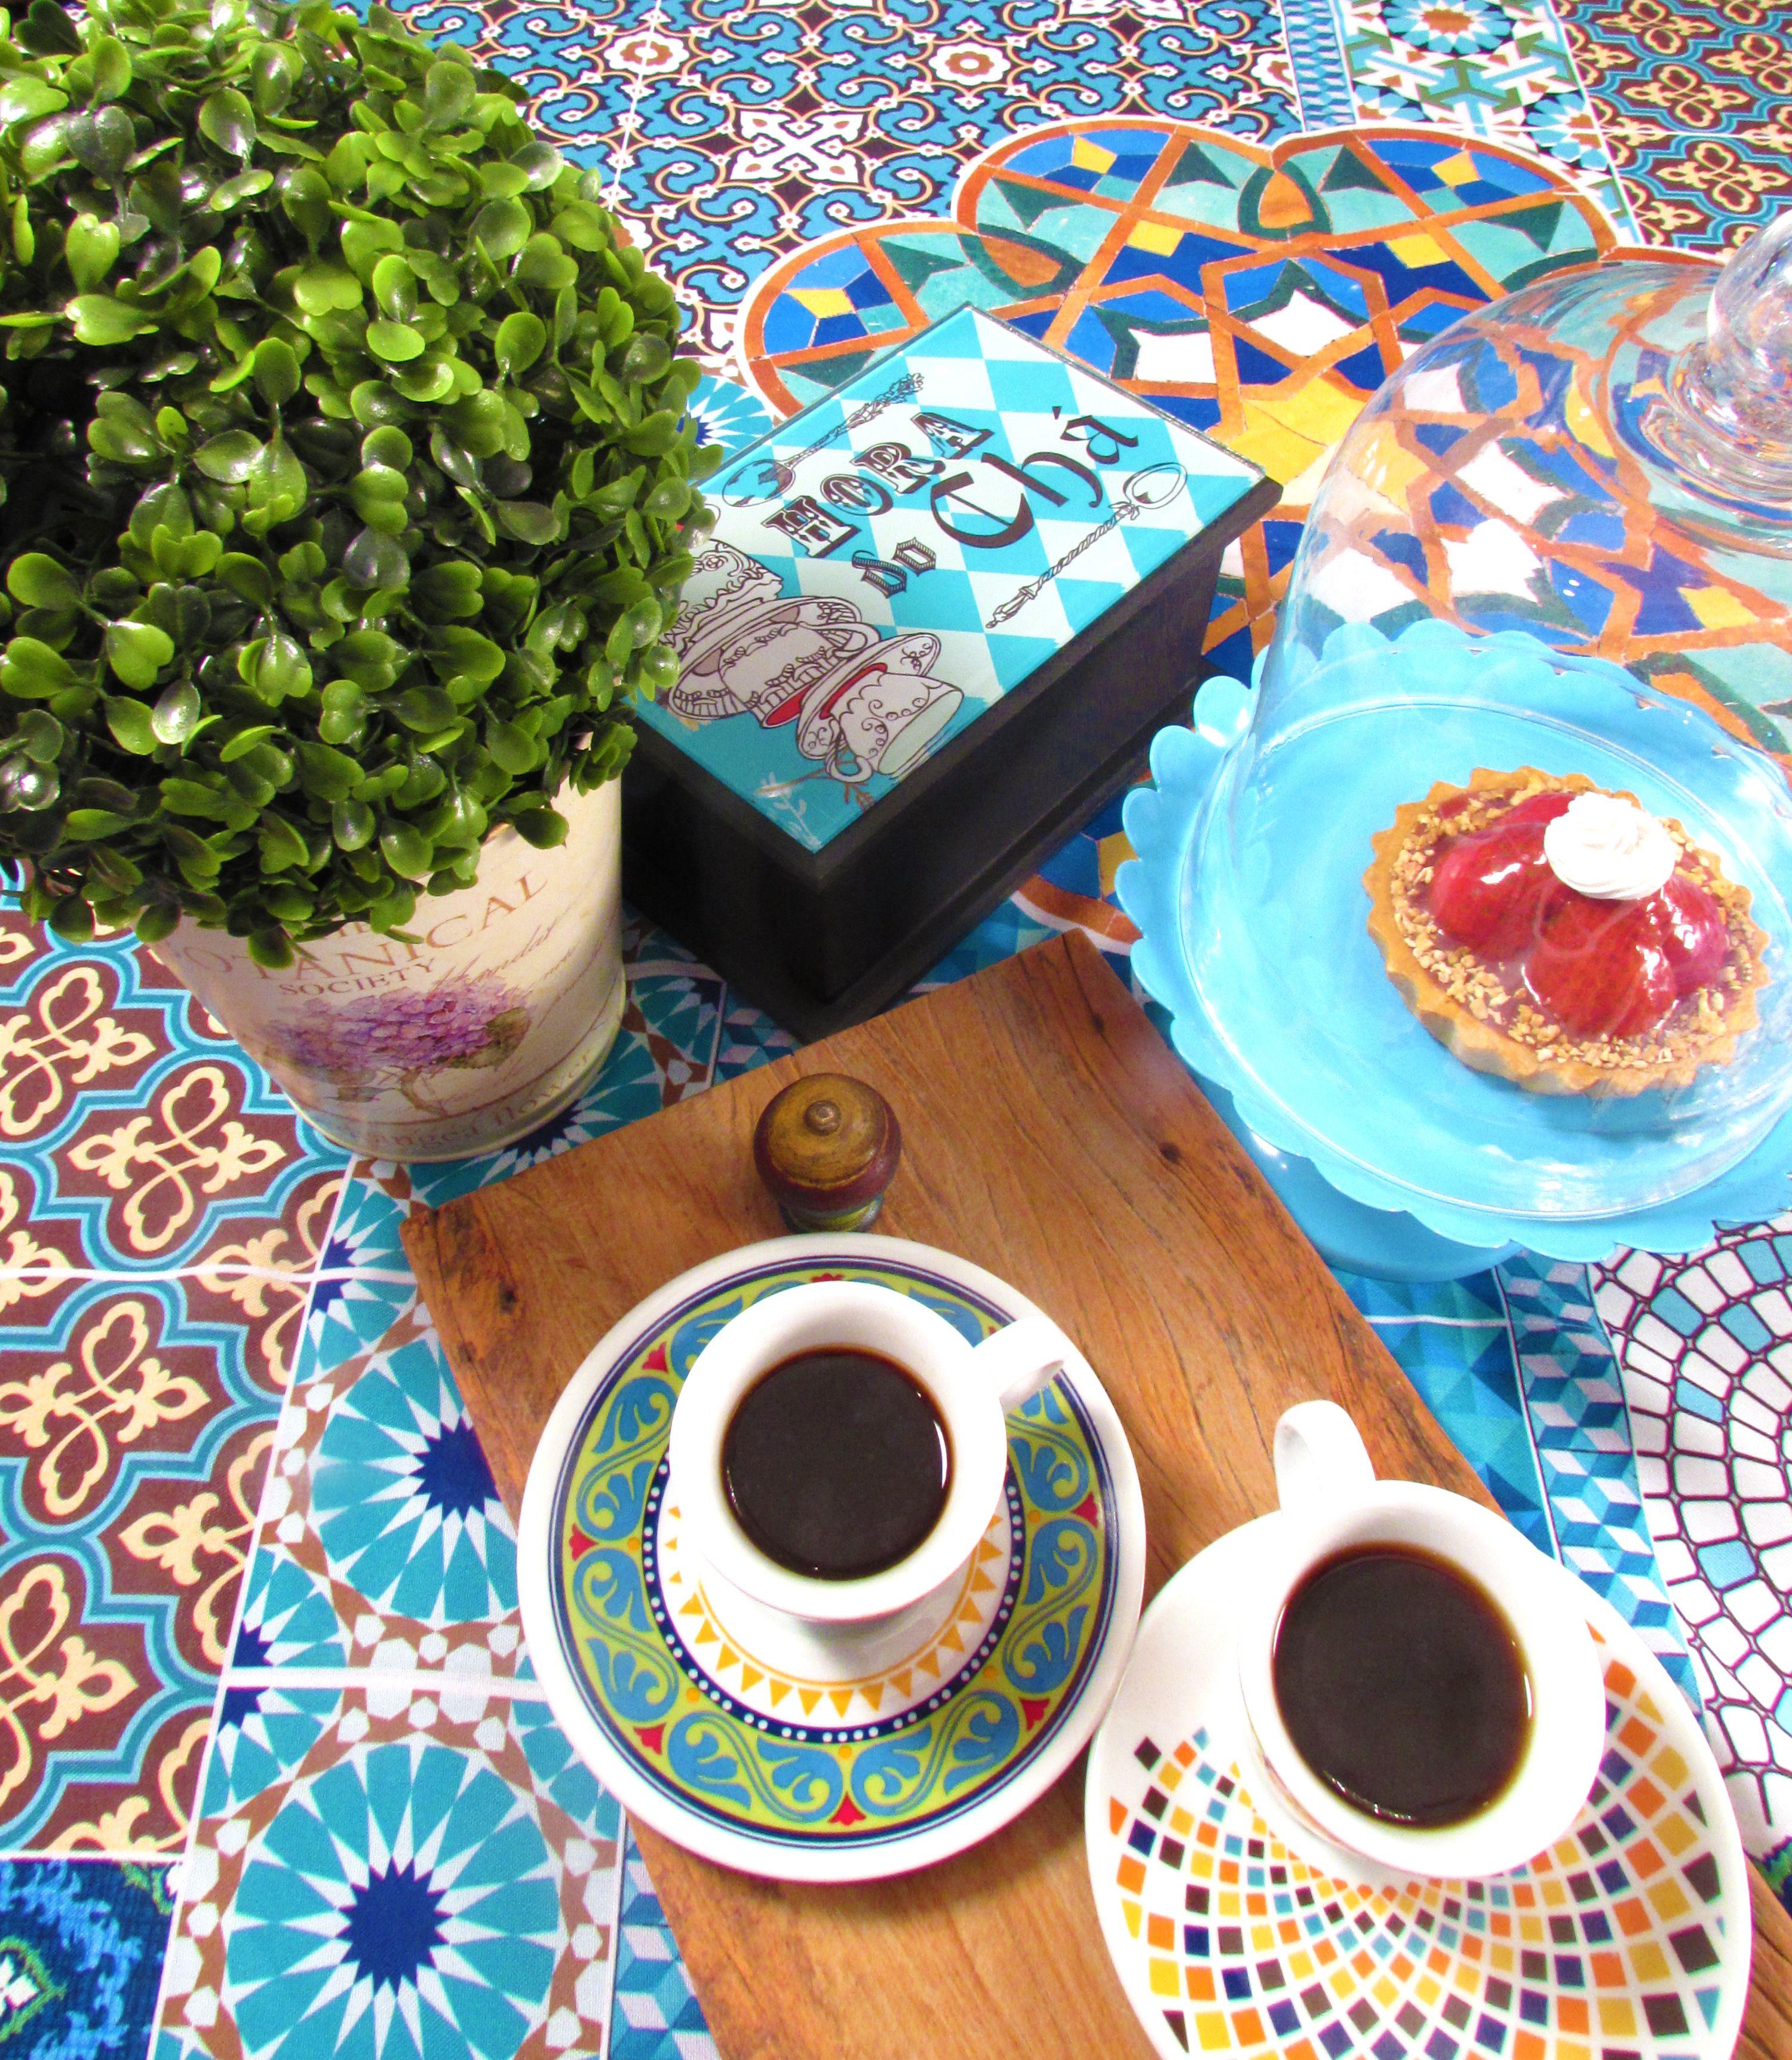 Hora do café! Hora do chá! Hora de @saocasa . Produtos exclusivos para transformar os momentos.